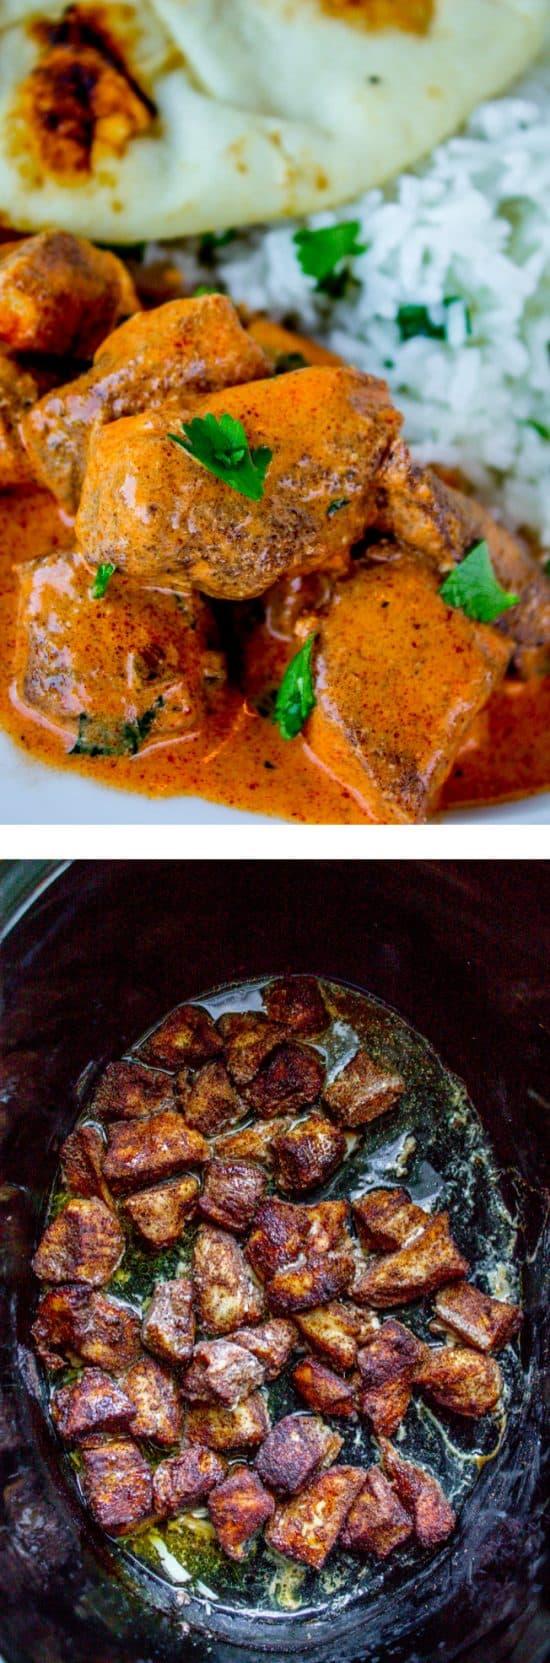 Slow Cooker Chicken Tikka Masala from The Food Charlatan